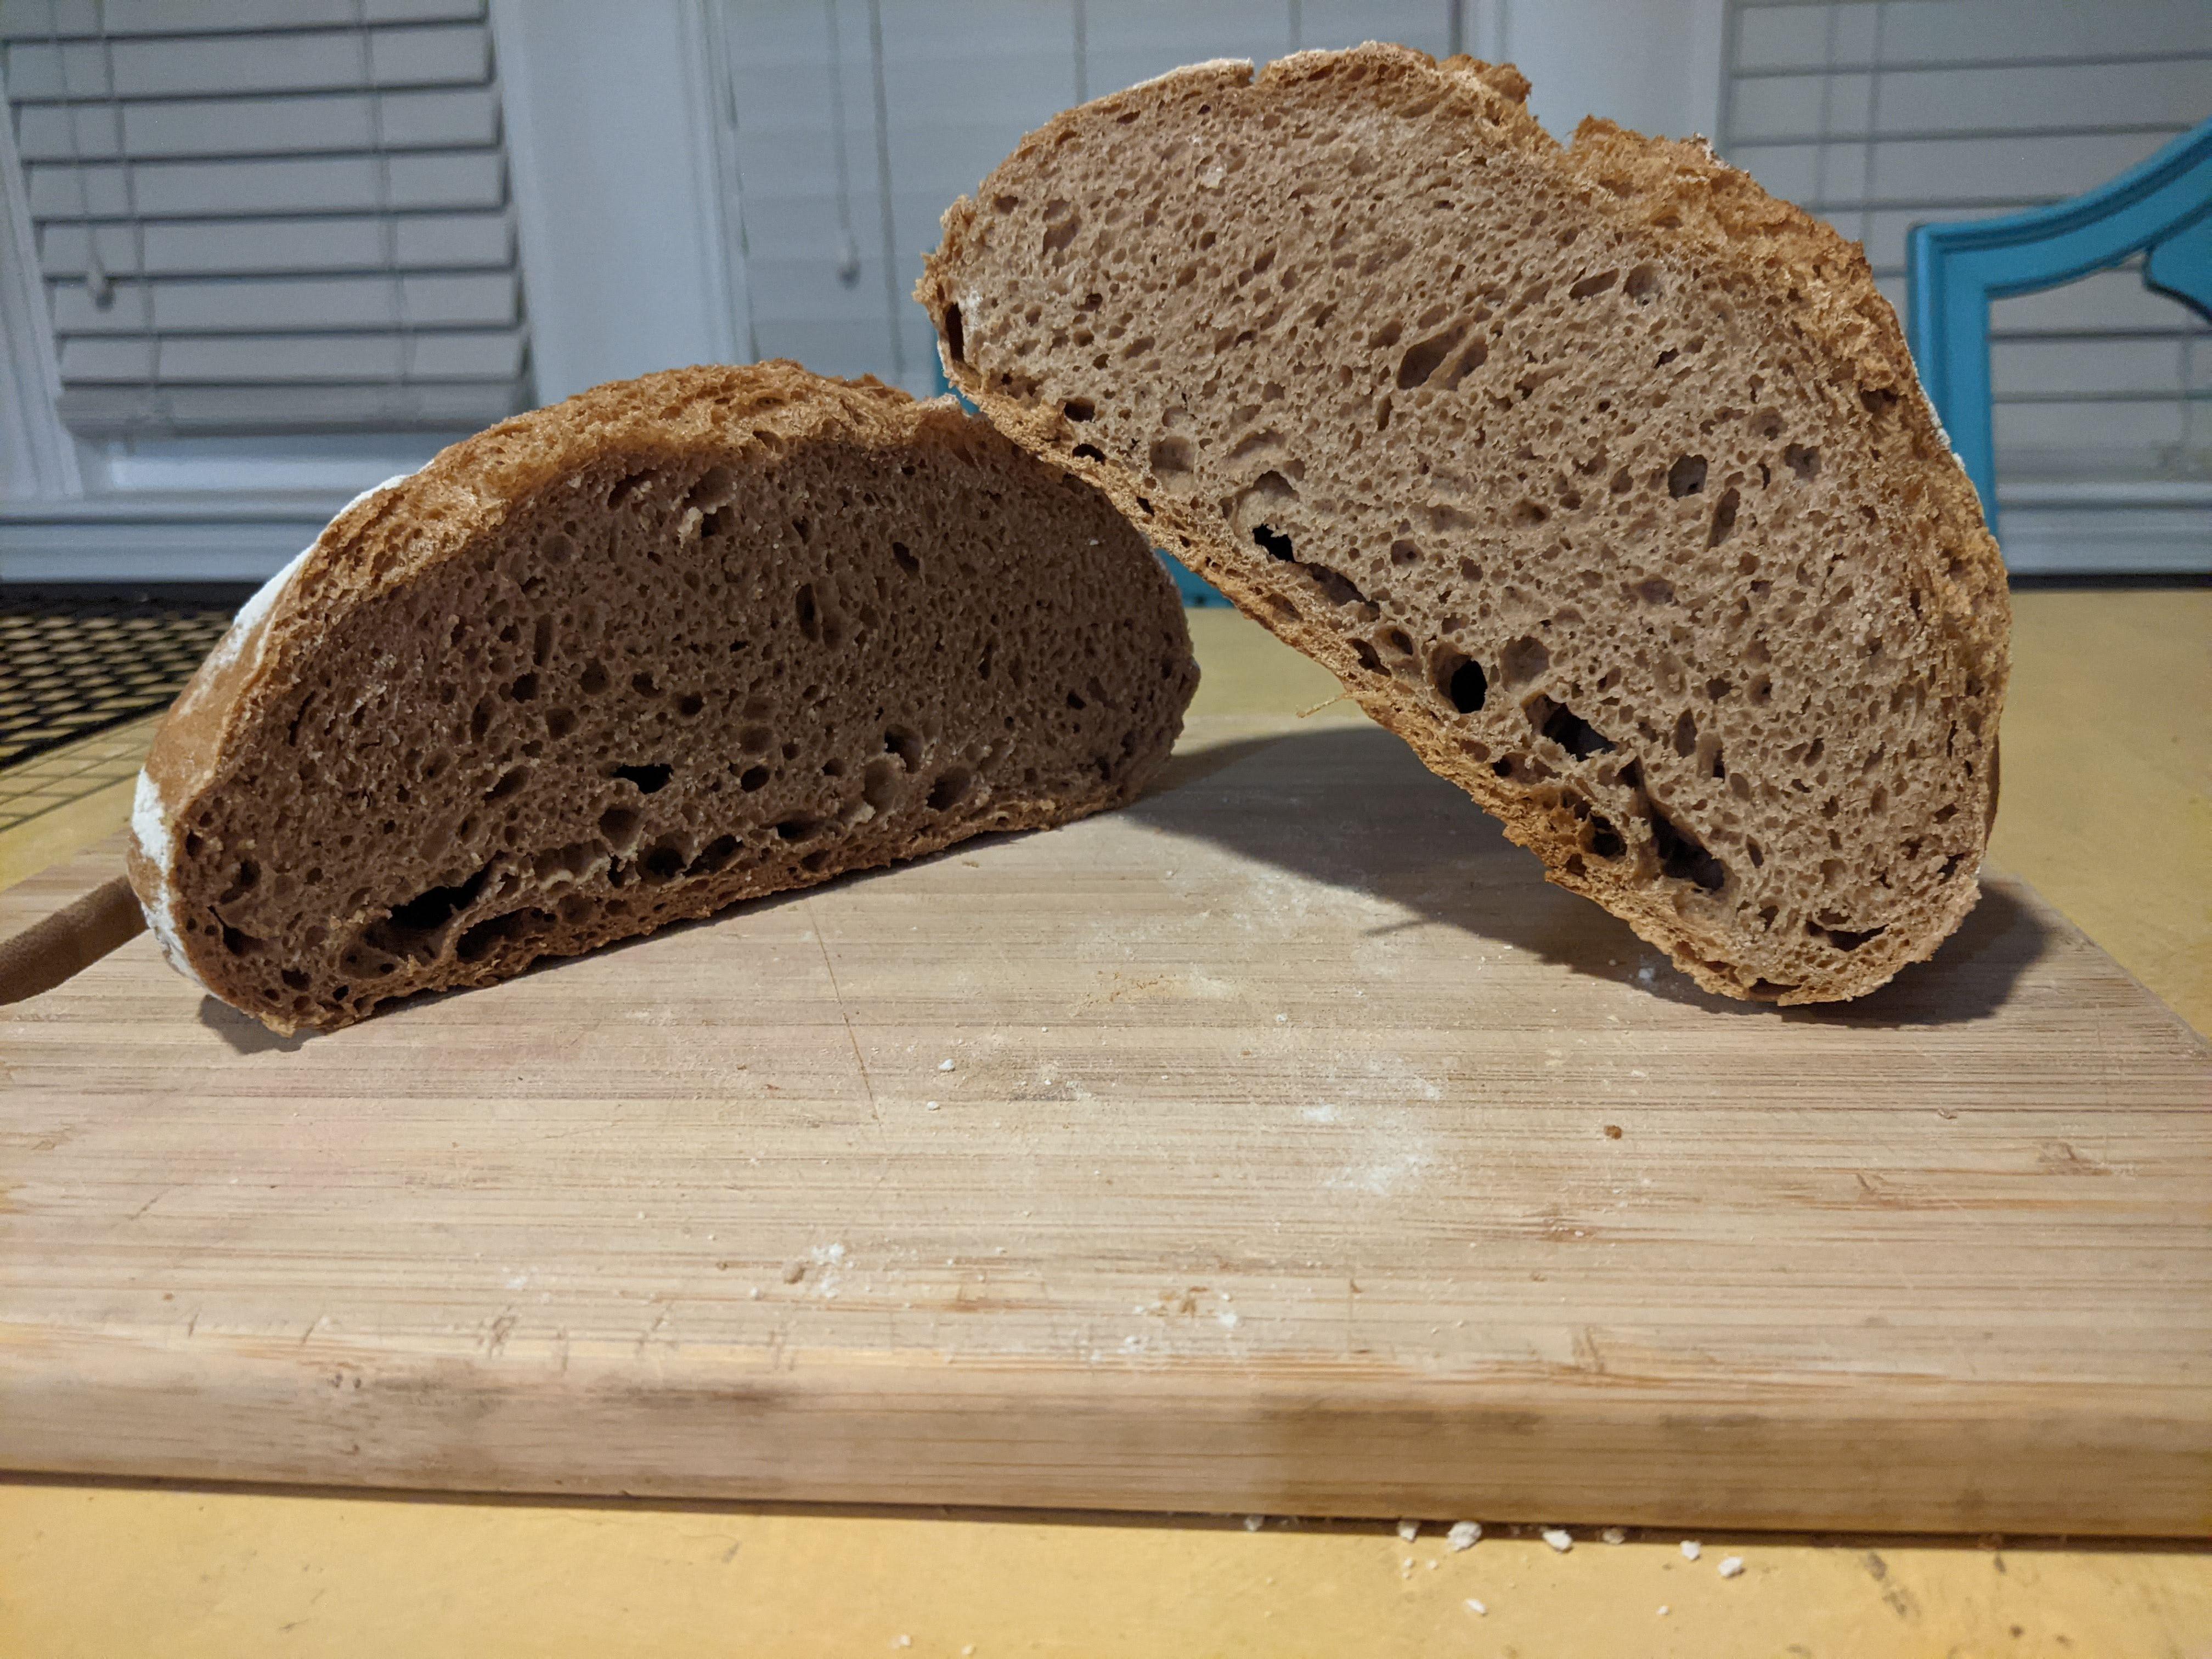 75% whole wheat loaf hut in half on cutting board